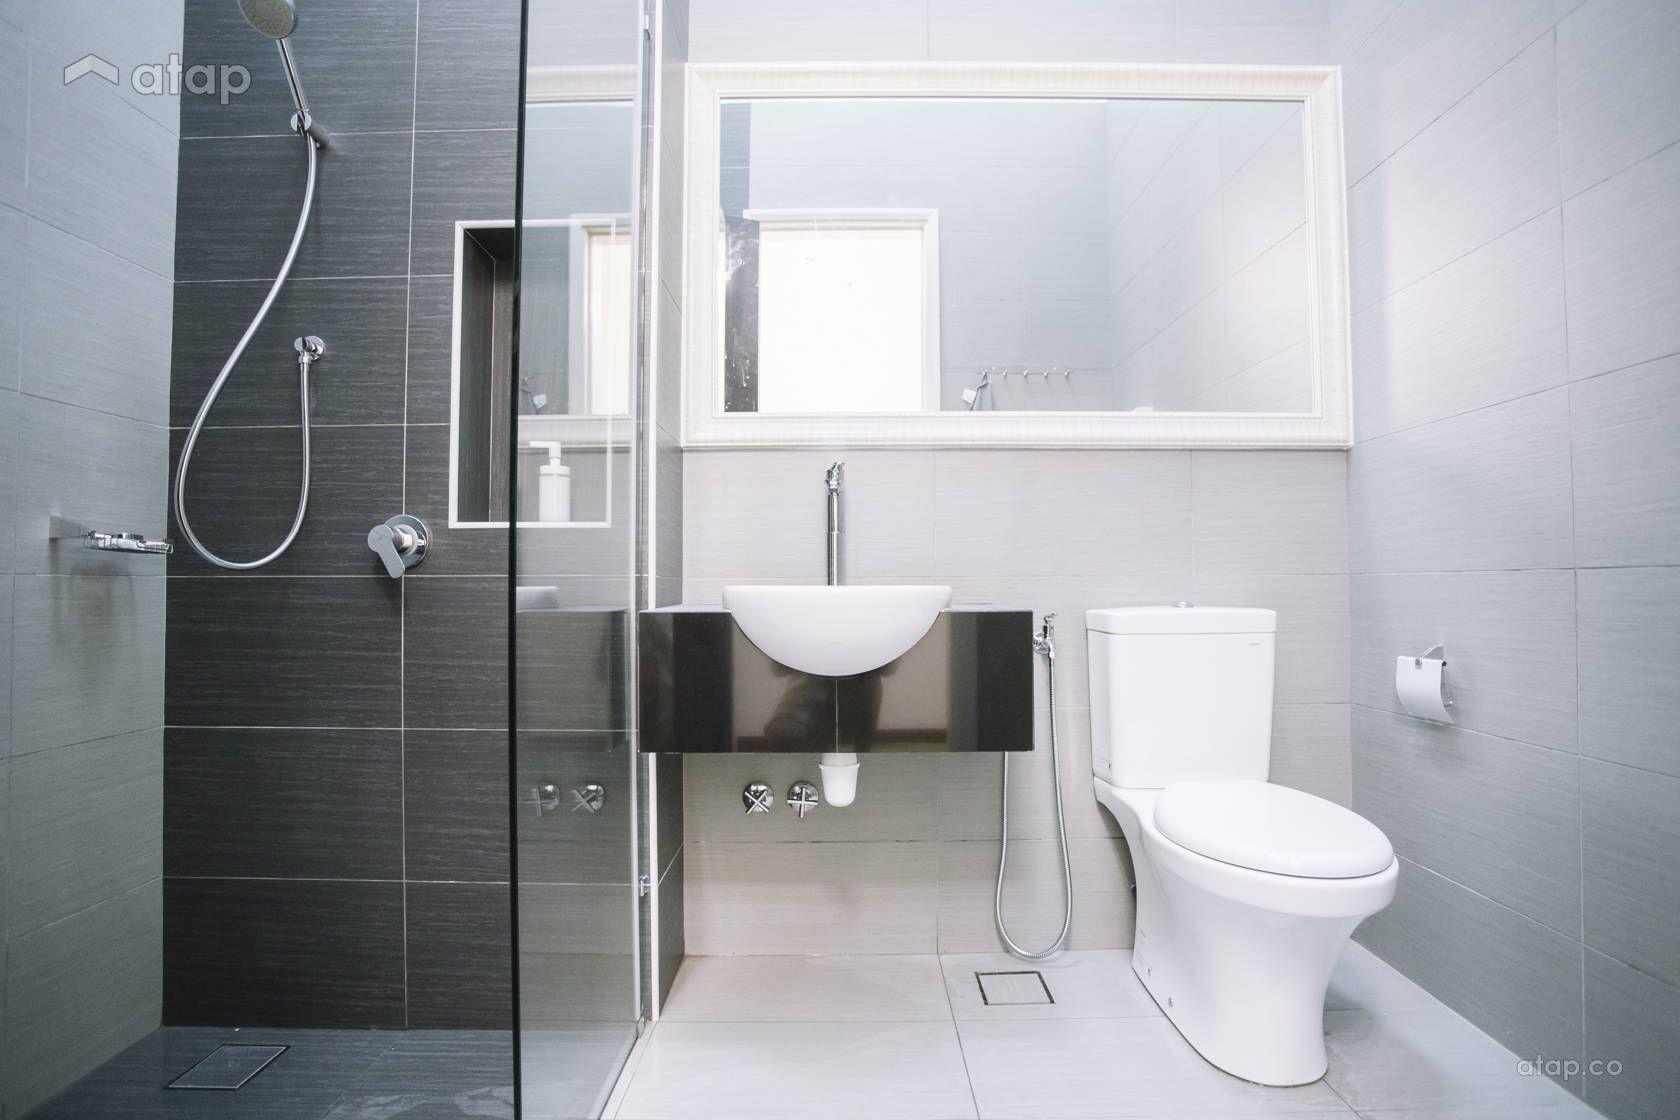 Contemporary Modern Bathroom Semi Detached Design Ideas Photos Malaysia Atap Co Narrow Bathroom Designs Bathroom Counter Designs Modern Bathroom Vanity